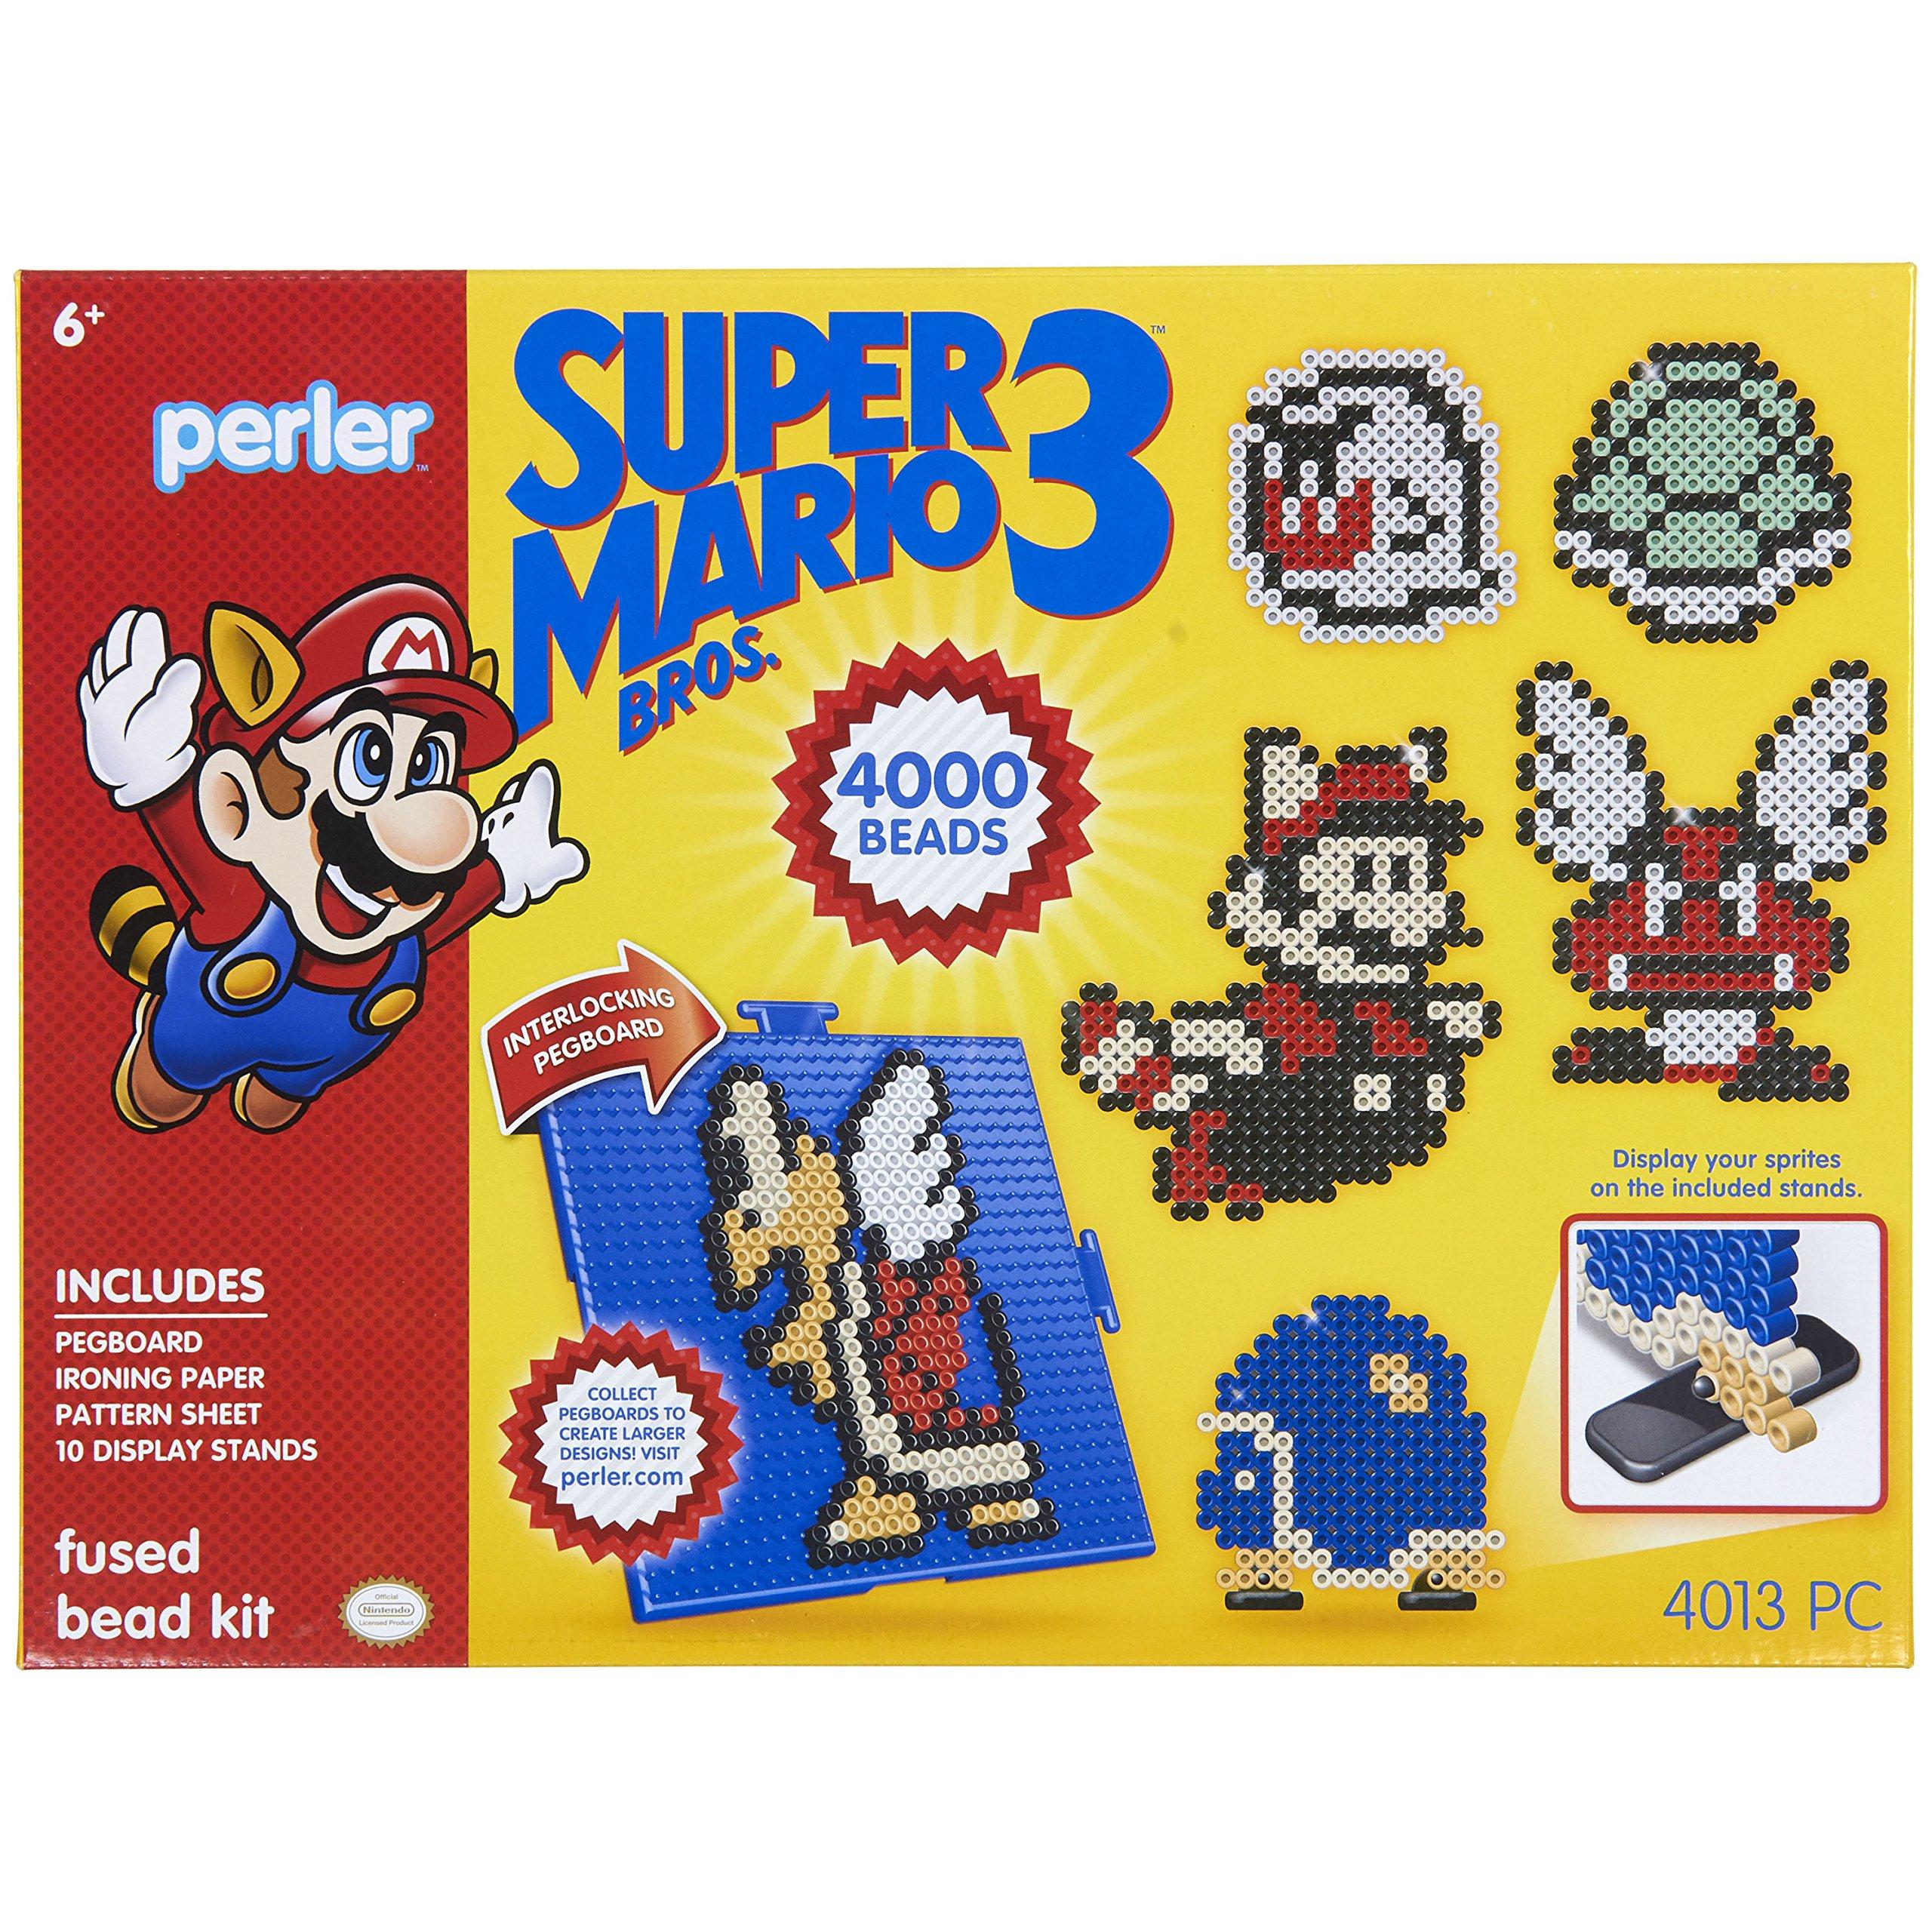 4503Pc Perler Beads Marvel Avengers Pattern and Fuse Bead Kit 10 Patterns